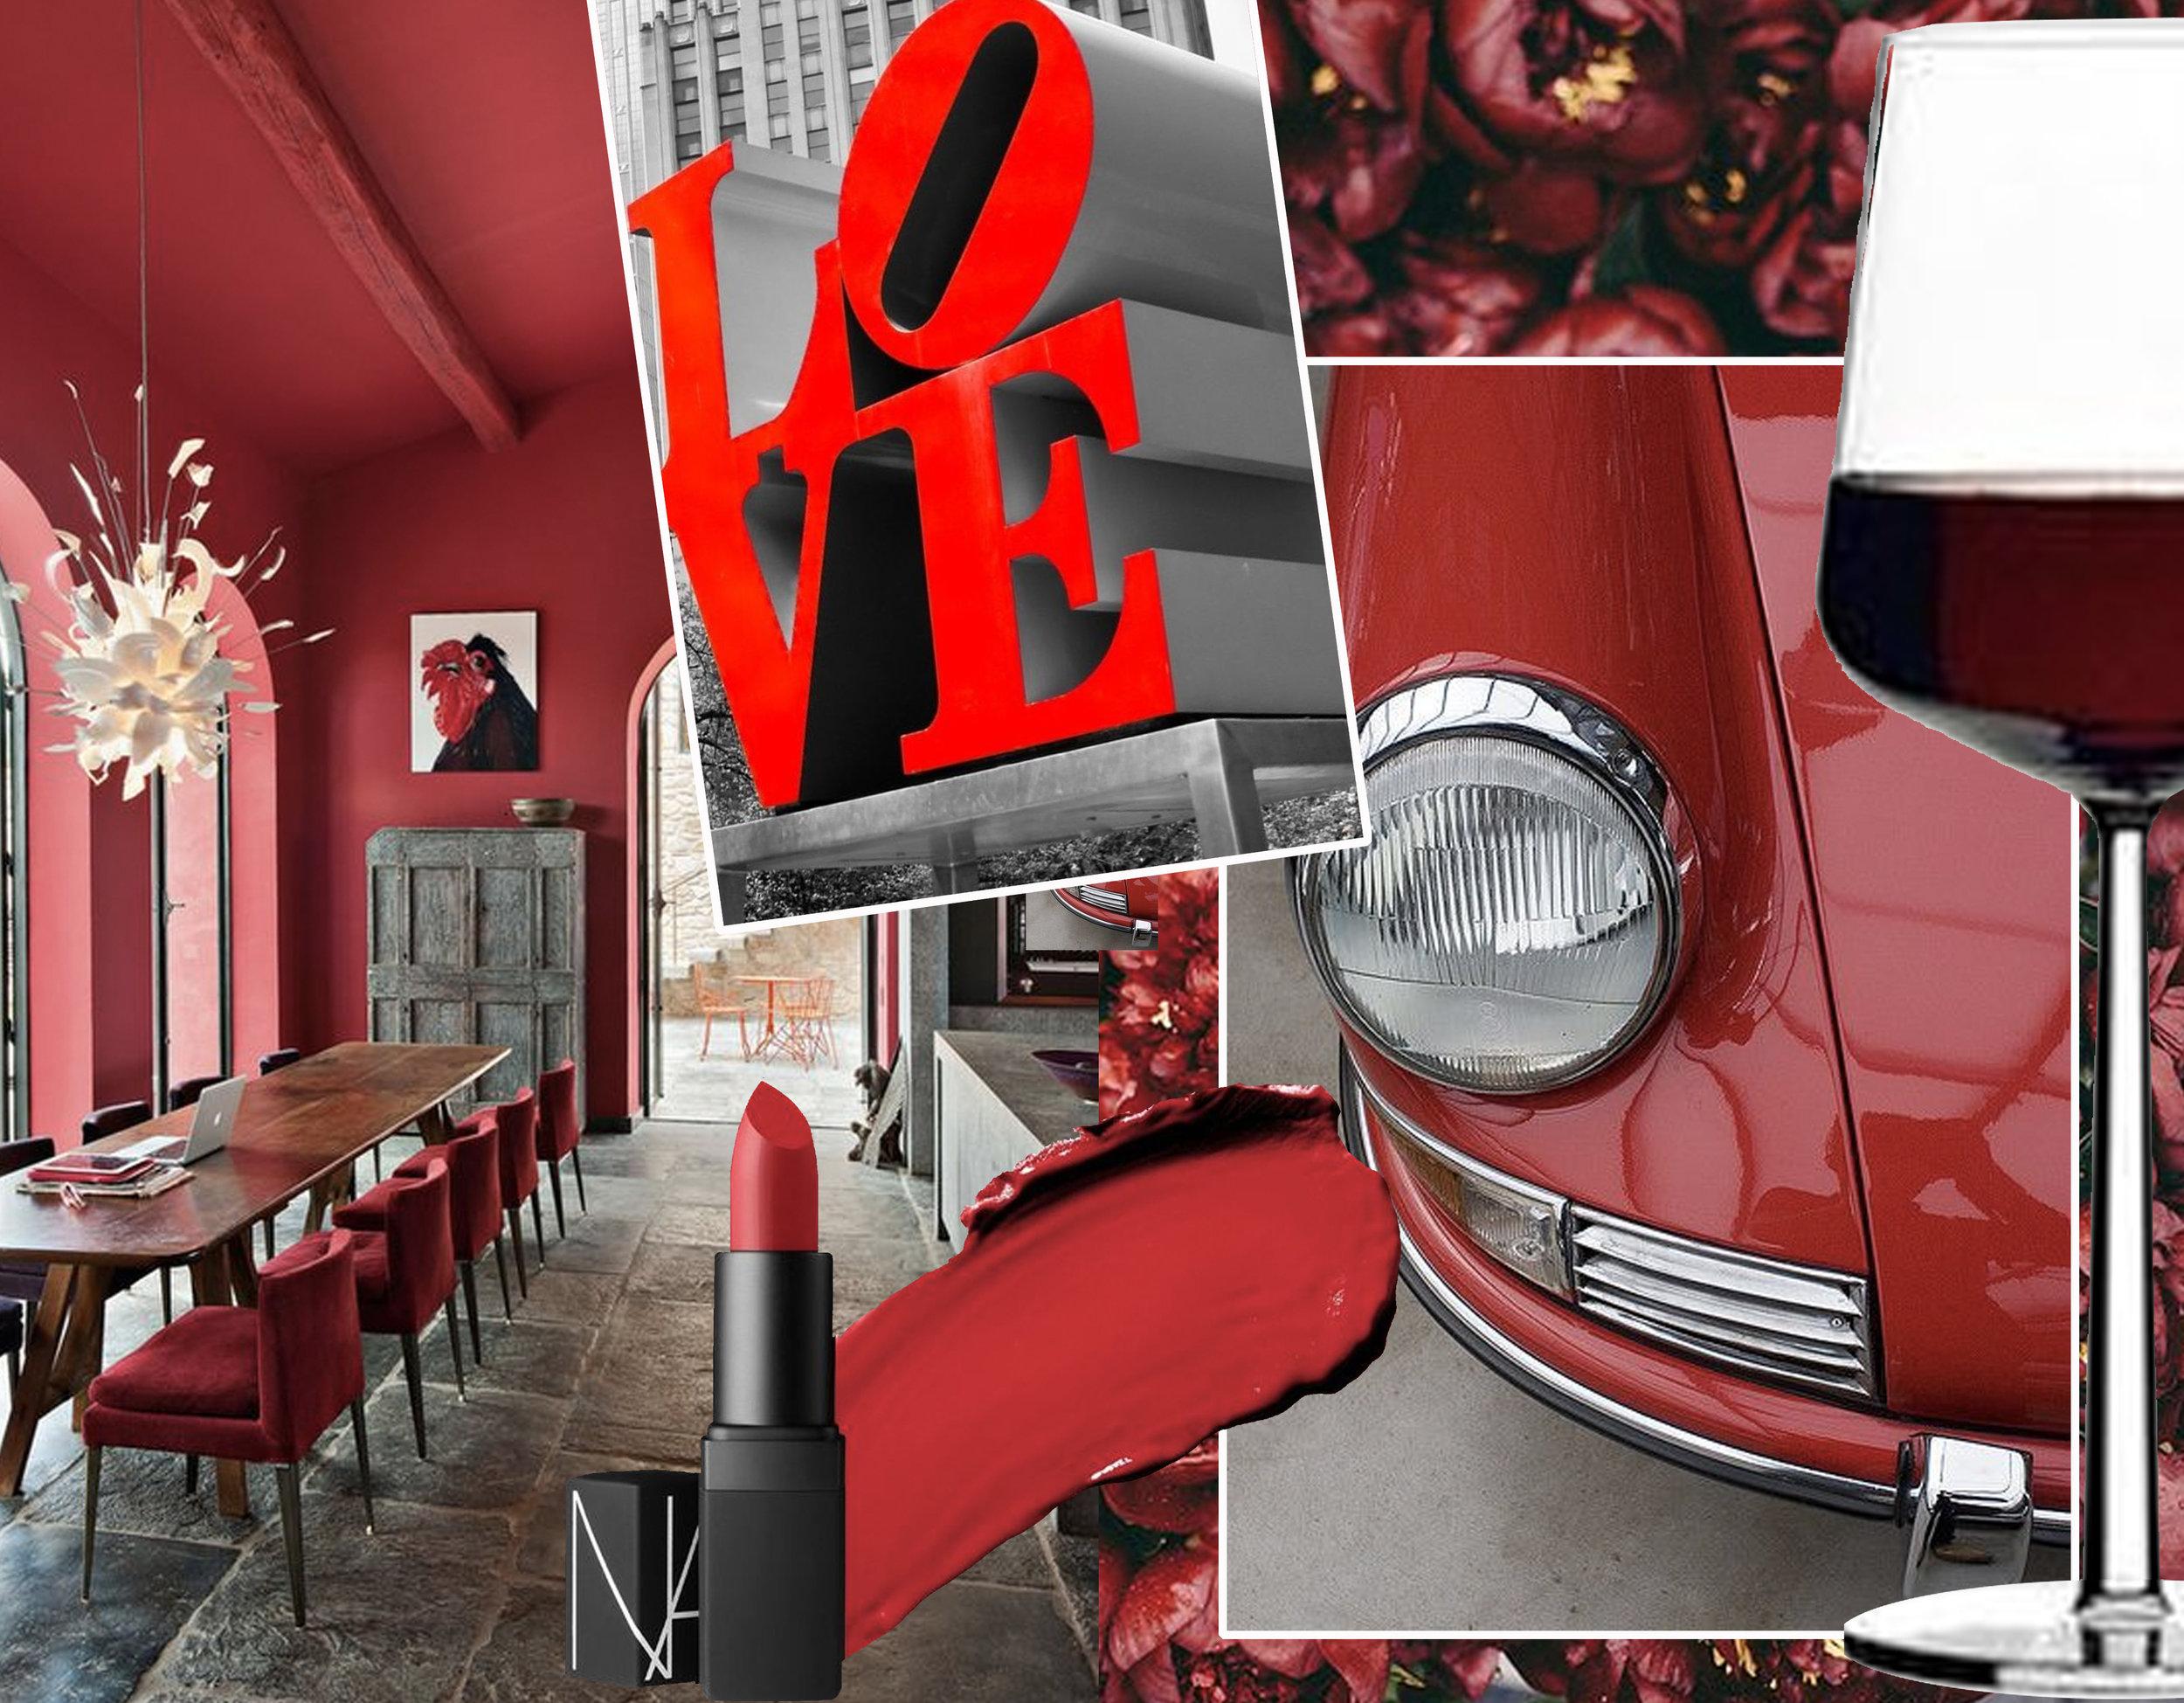 interior via  AD Magazine  - lipstick via  Harpers Bazaar  - Love via - car via  Jalopnik  - glass of red wine via J oss & Main  - flowers in the back via  Flickr